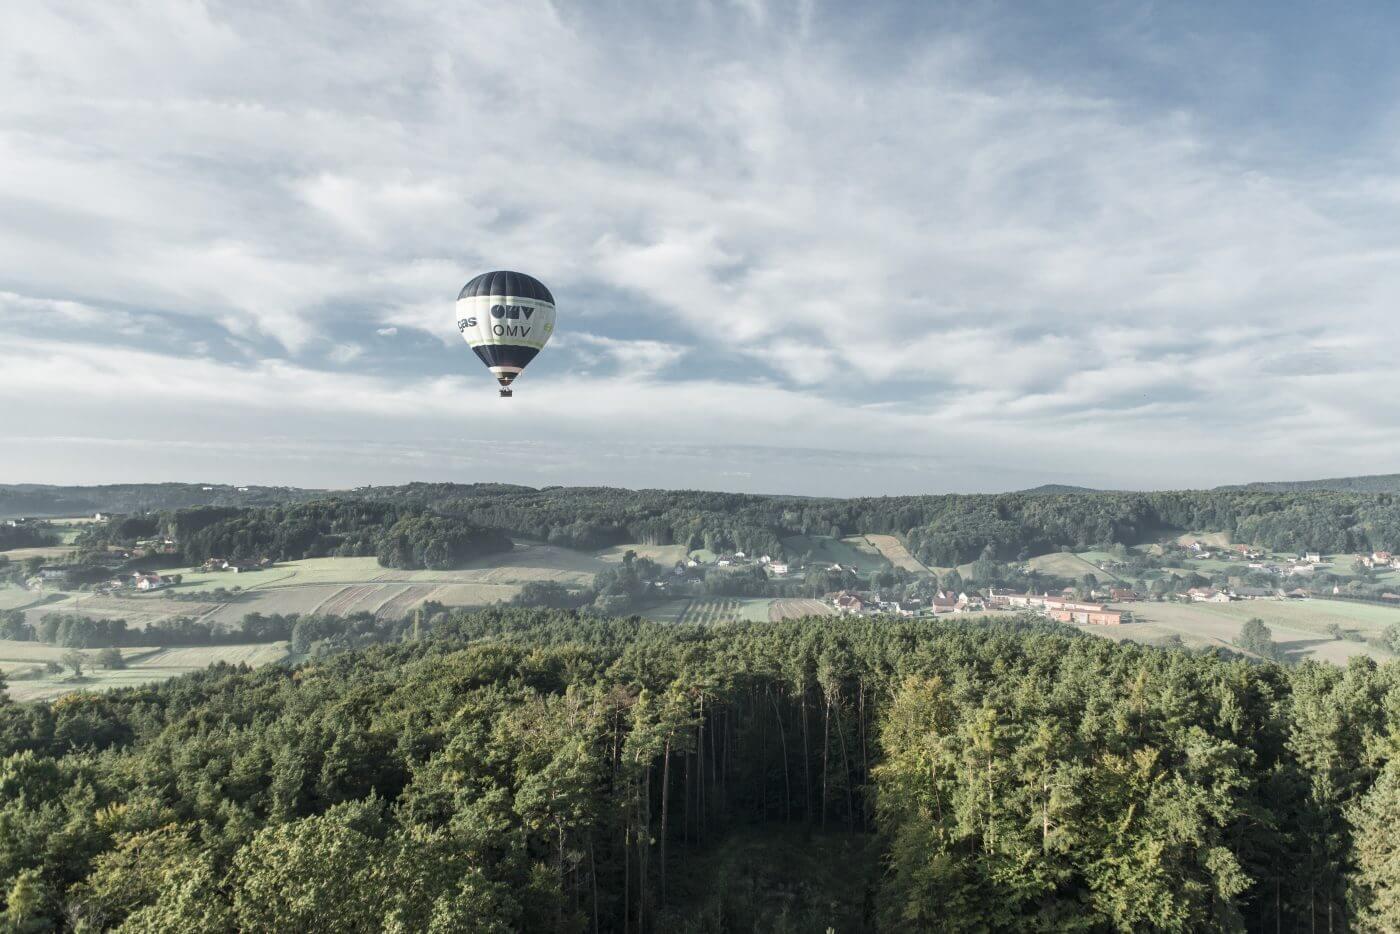 Ballonfahrt, Apfelland